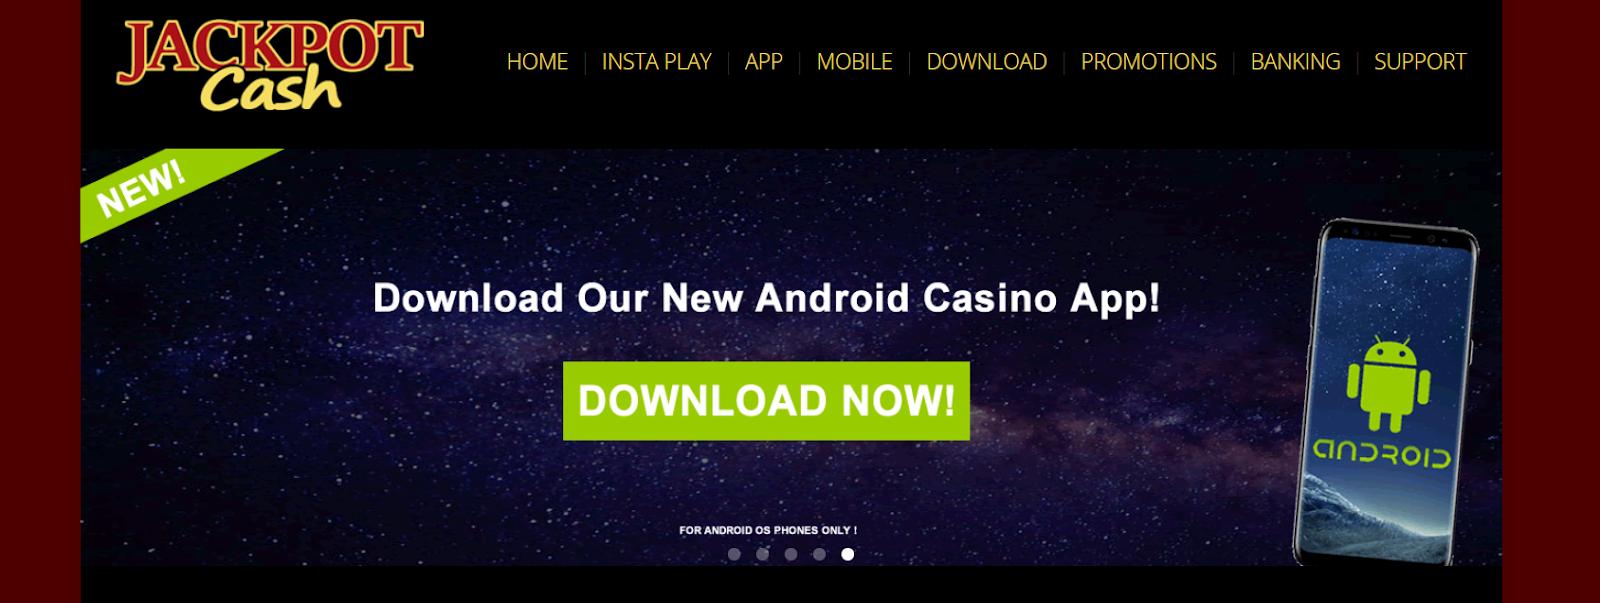 Silver sands casino promotions 2018 calendar